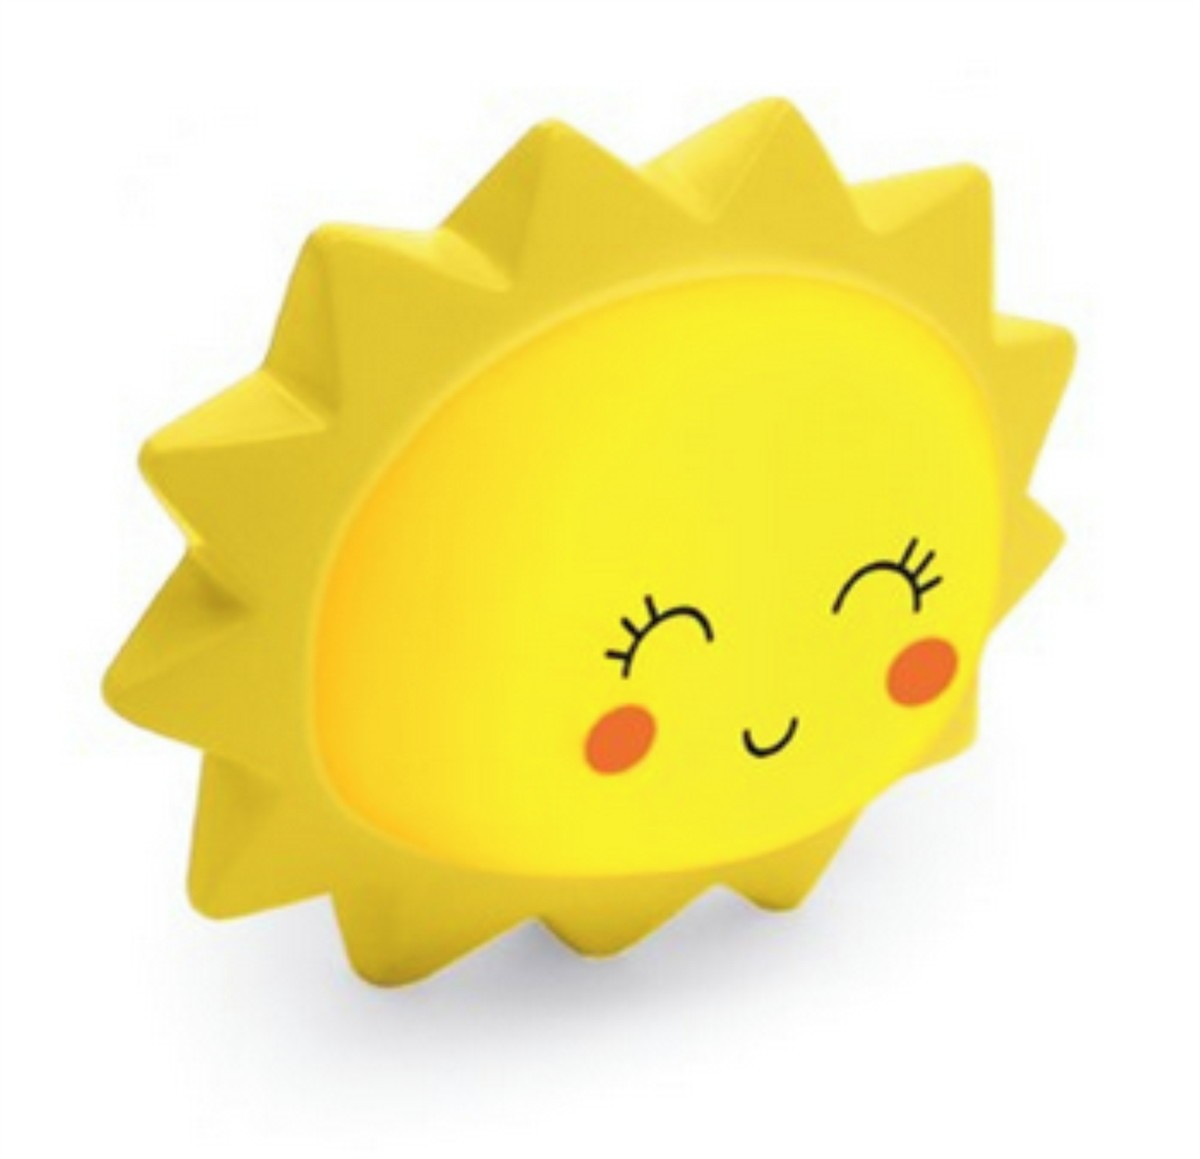 Luminária Abajur Infantil Led Noturna Sol